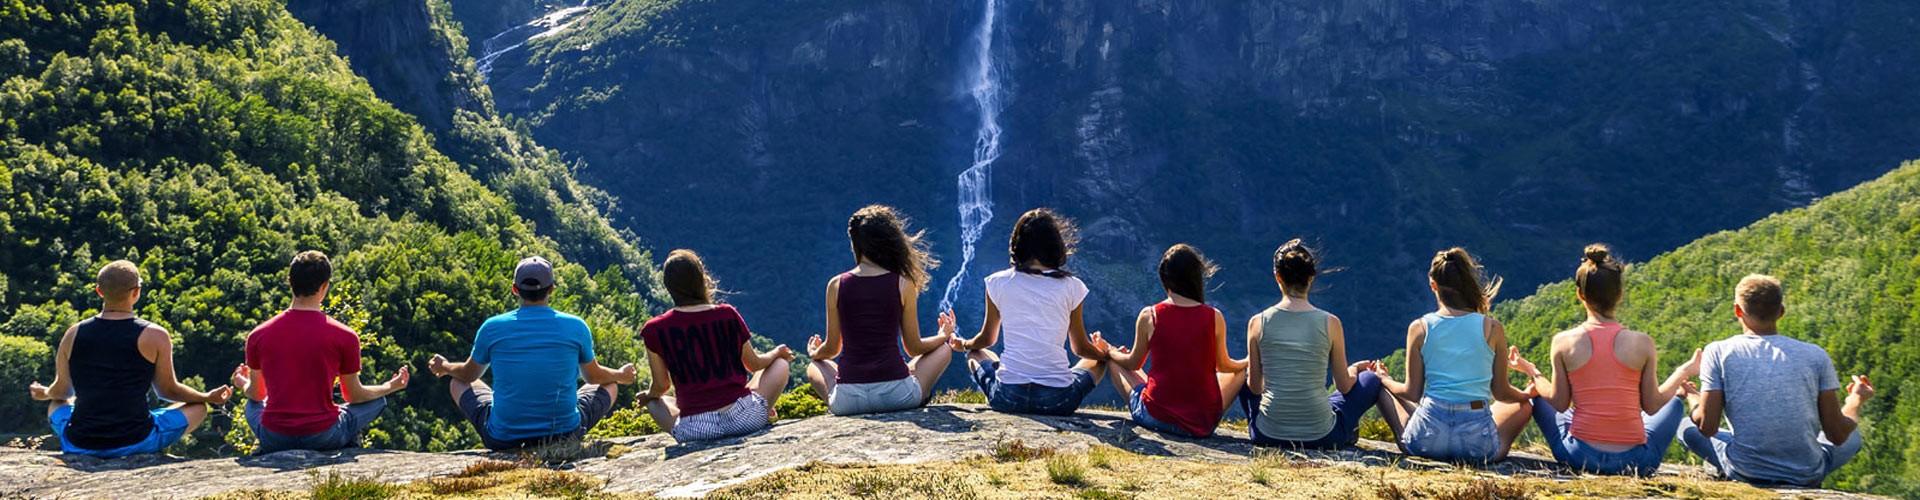 Alpen Meditation in Berchtesgaden